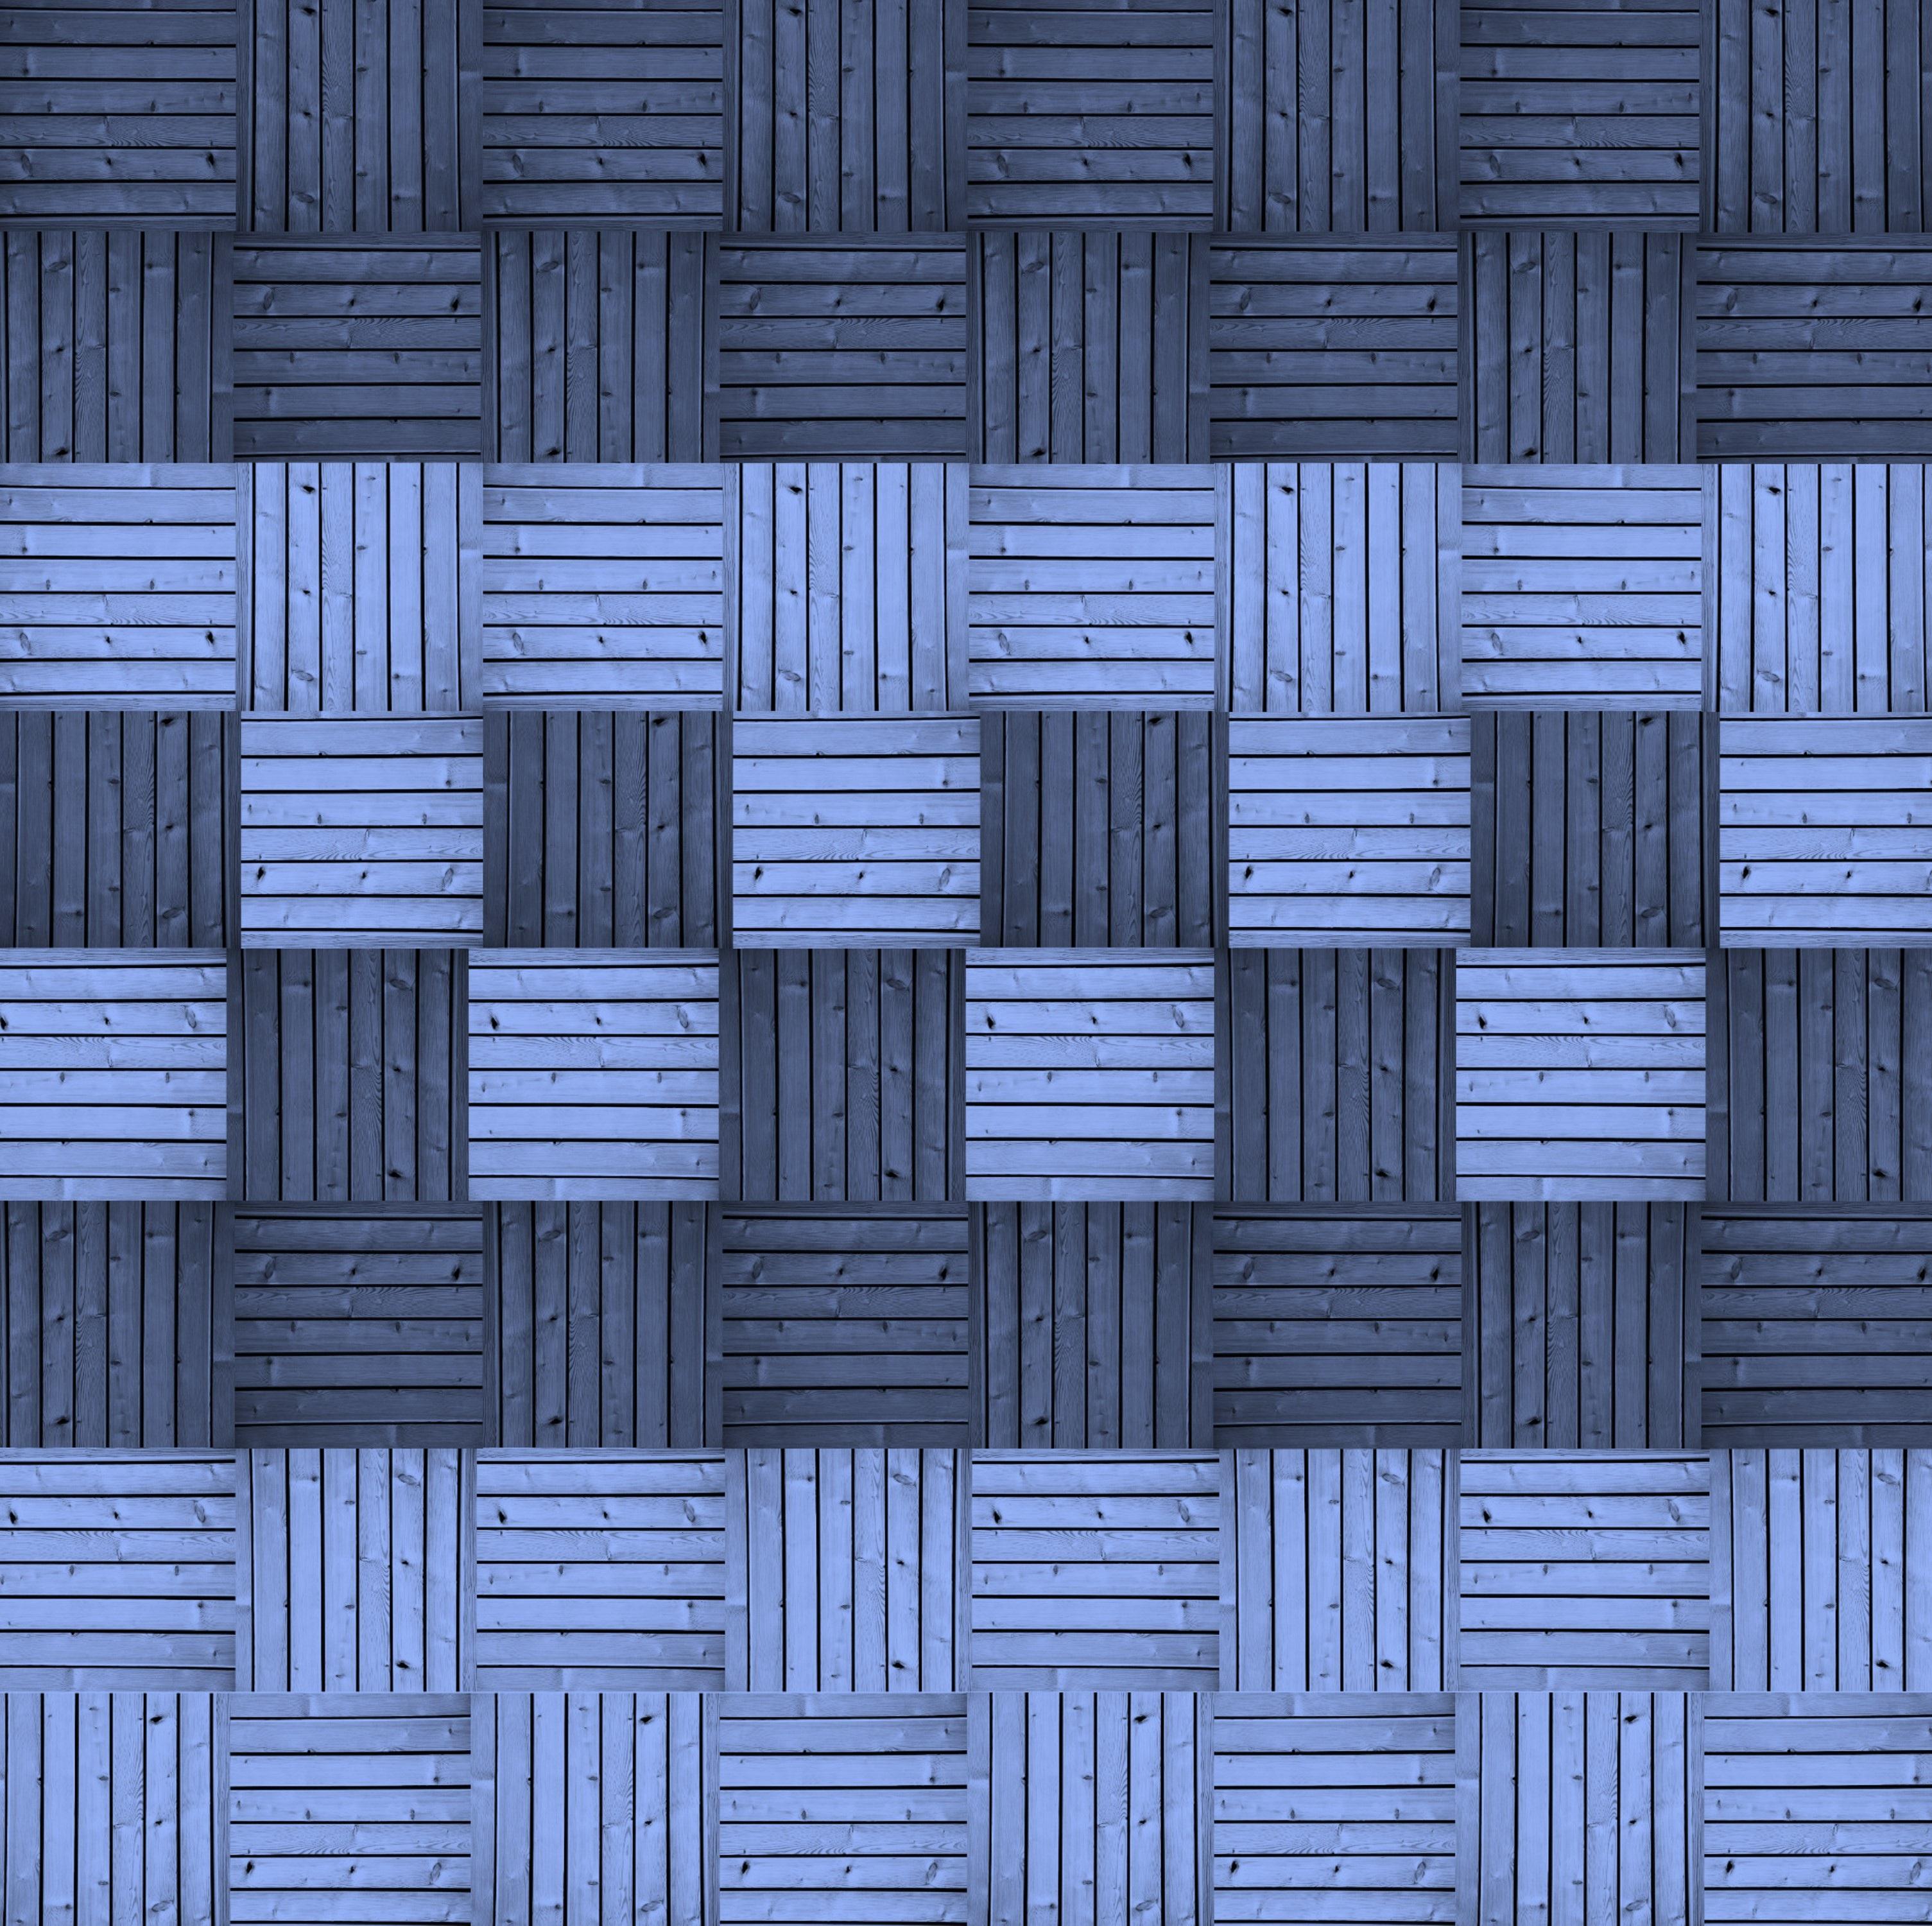 texture digital art pattern square